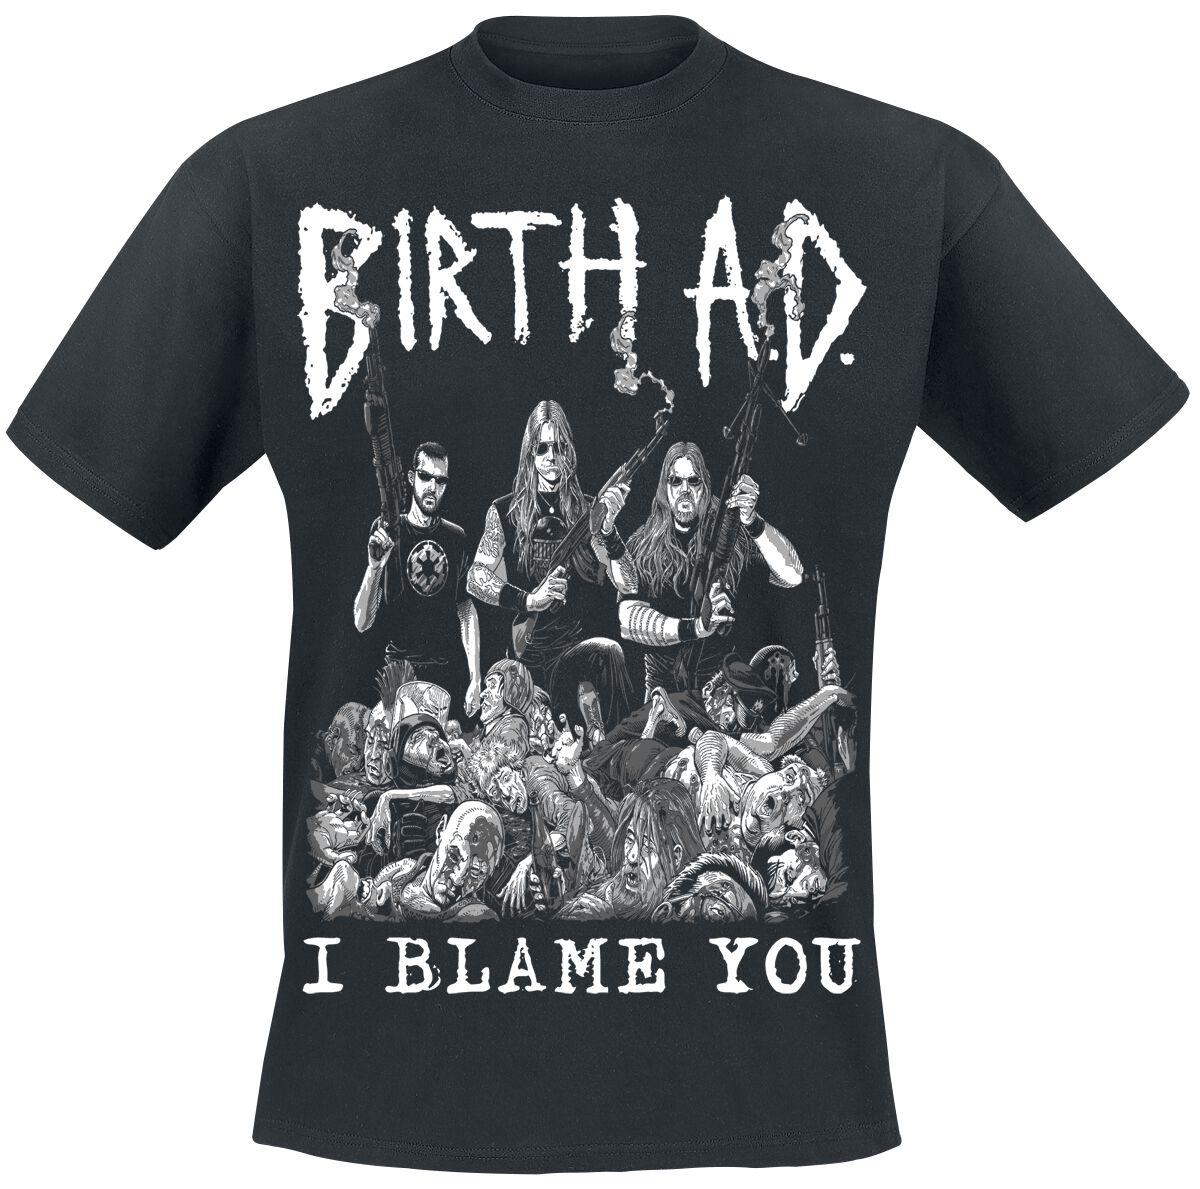 Zespoły - Koszulki - T-Shirt Birth A.D. Kill Everybody T-Shirt czarny - 297411